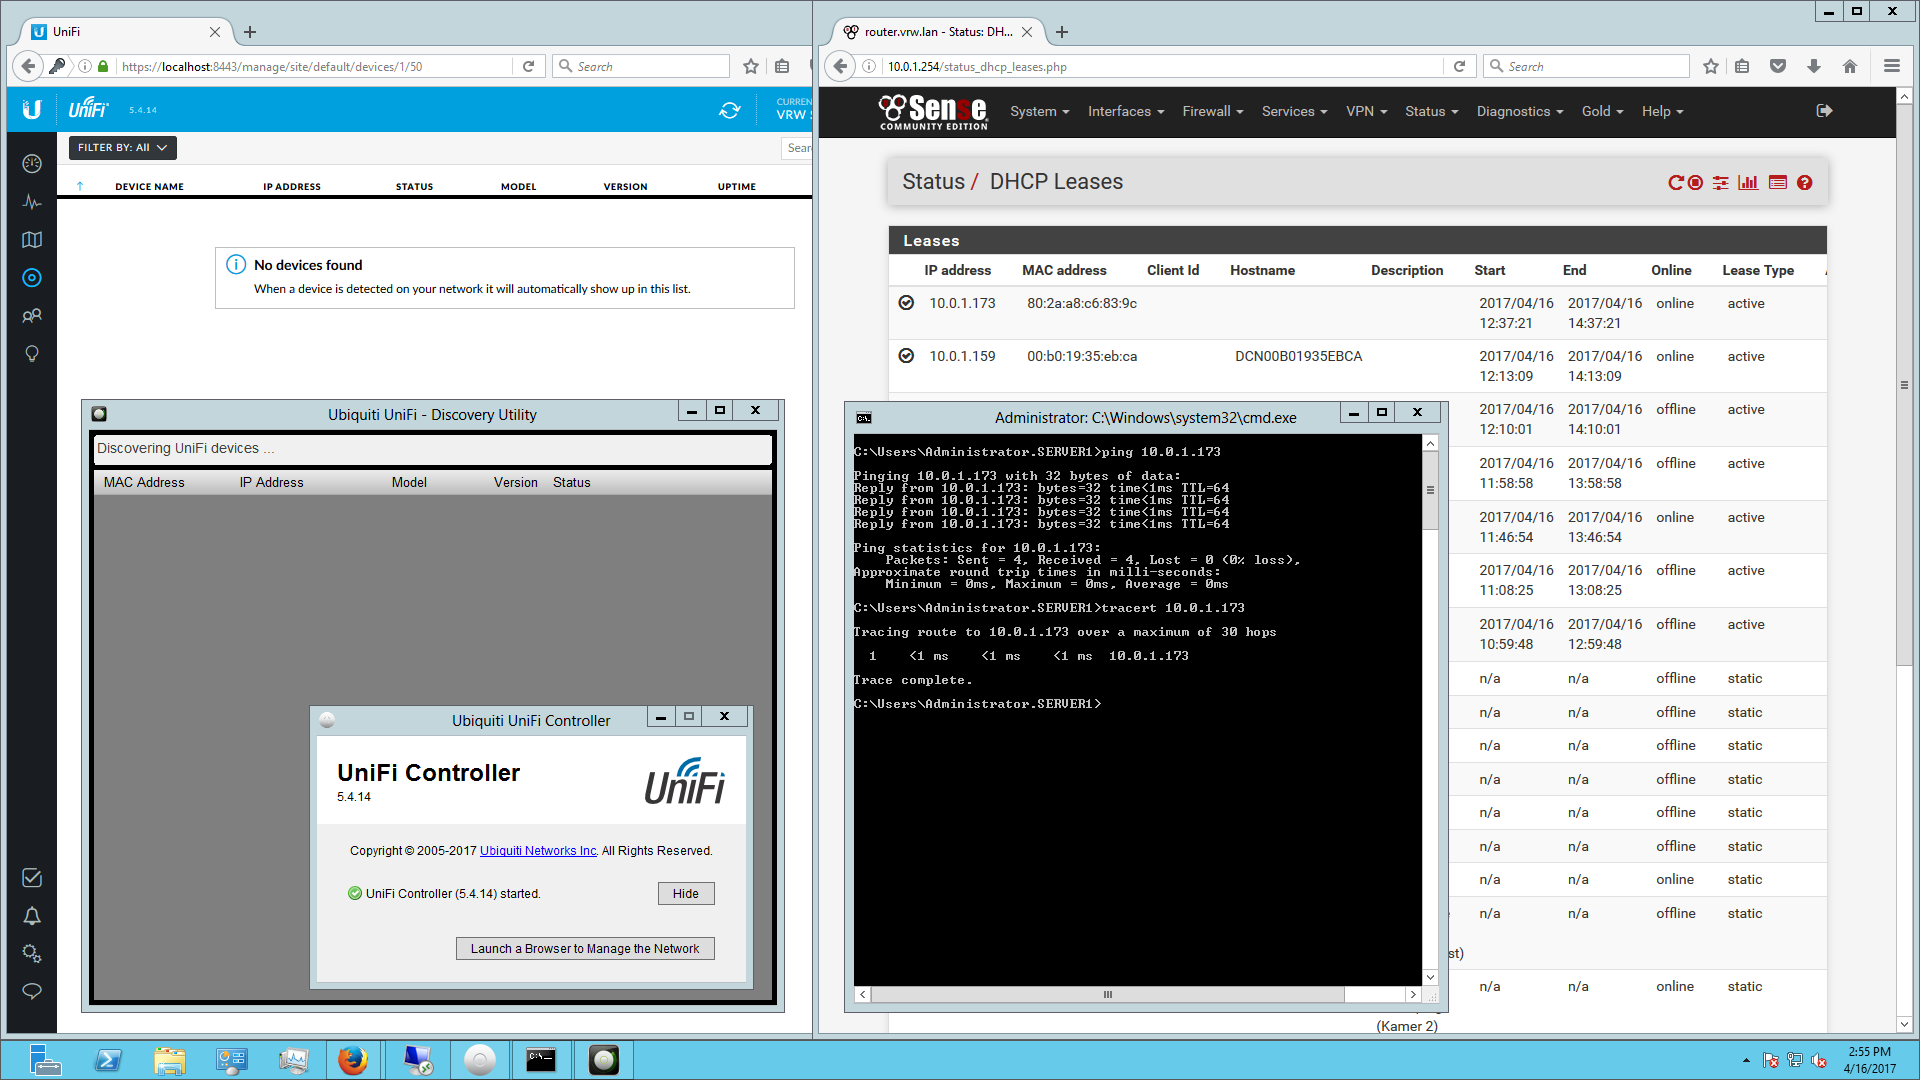 😍 Ubiquiti controller windows server 2012 | Free  2019-03-18